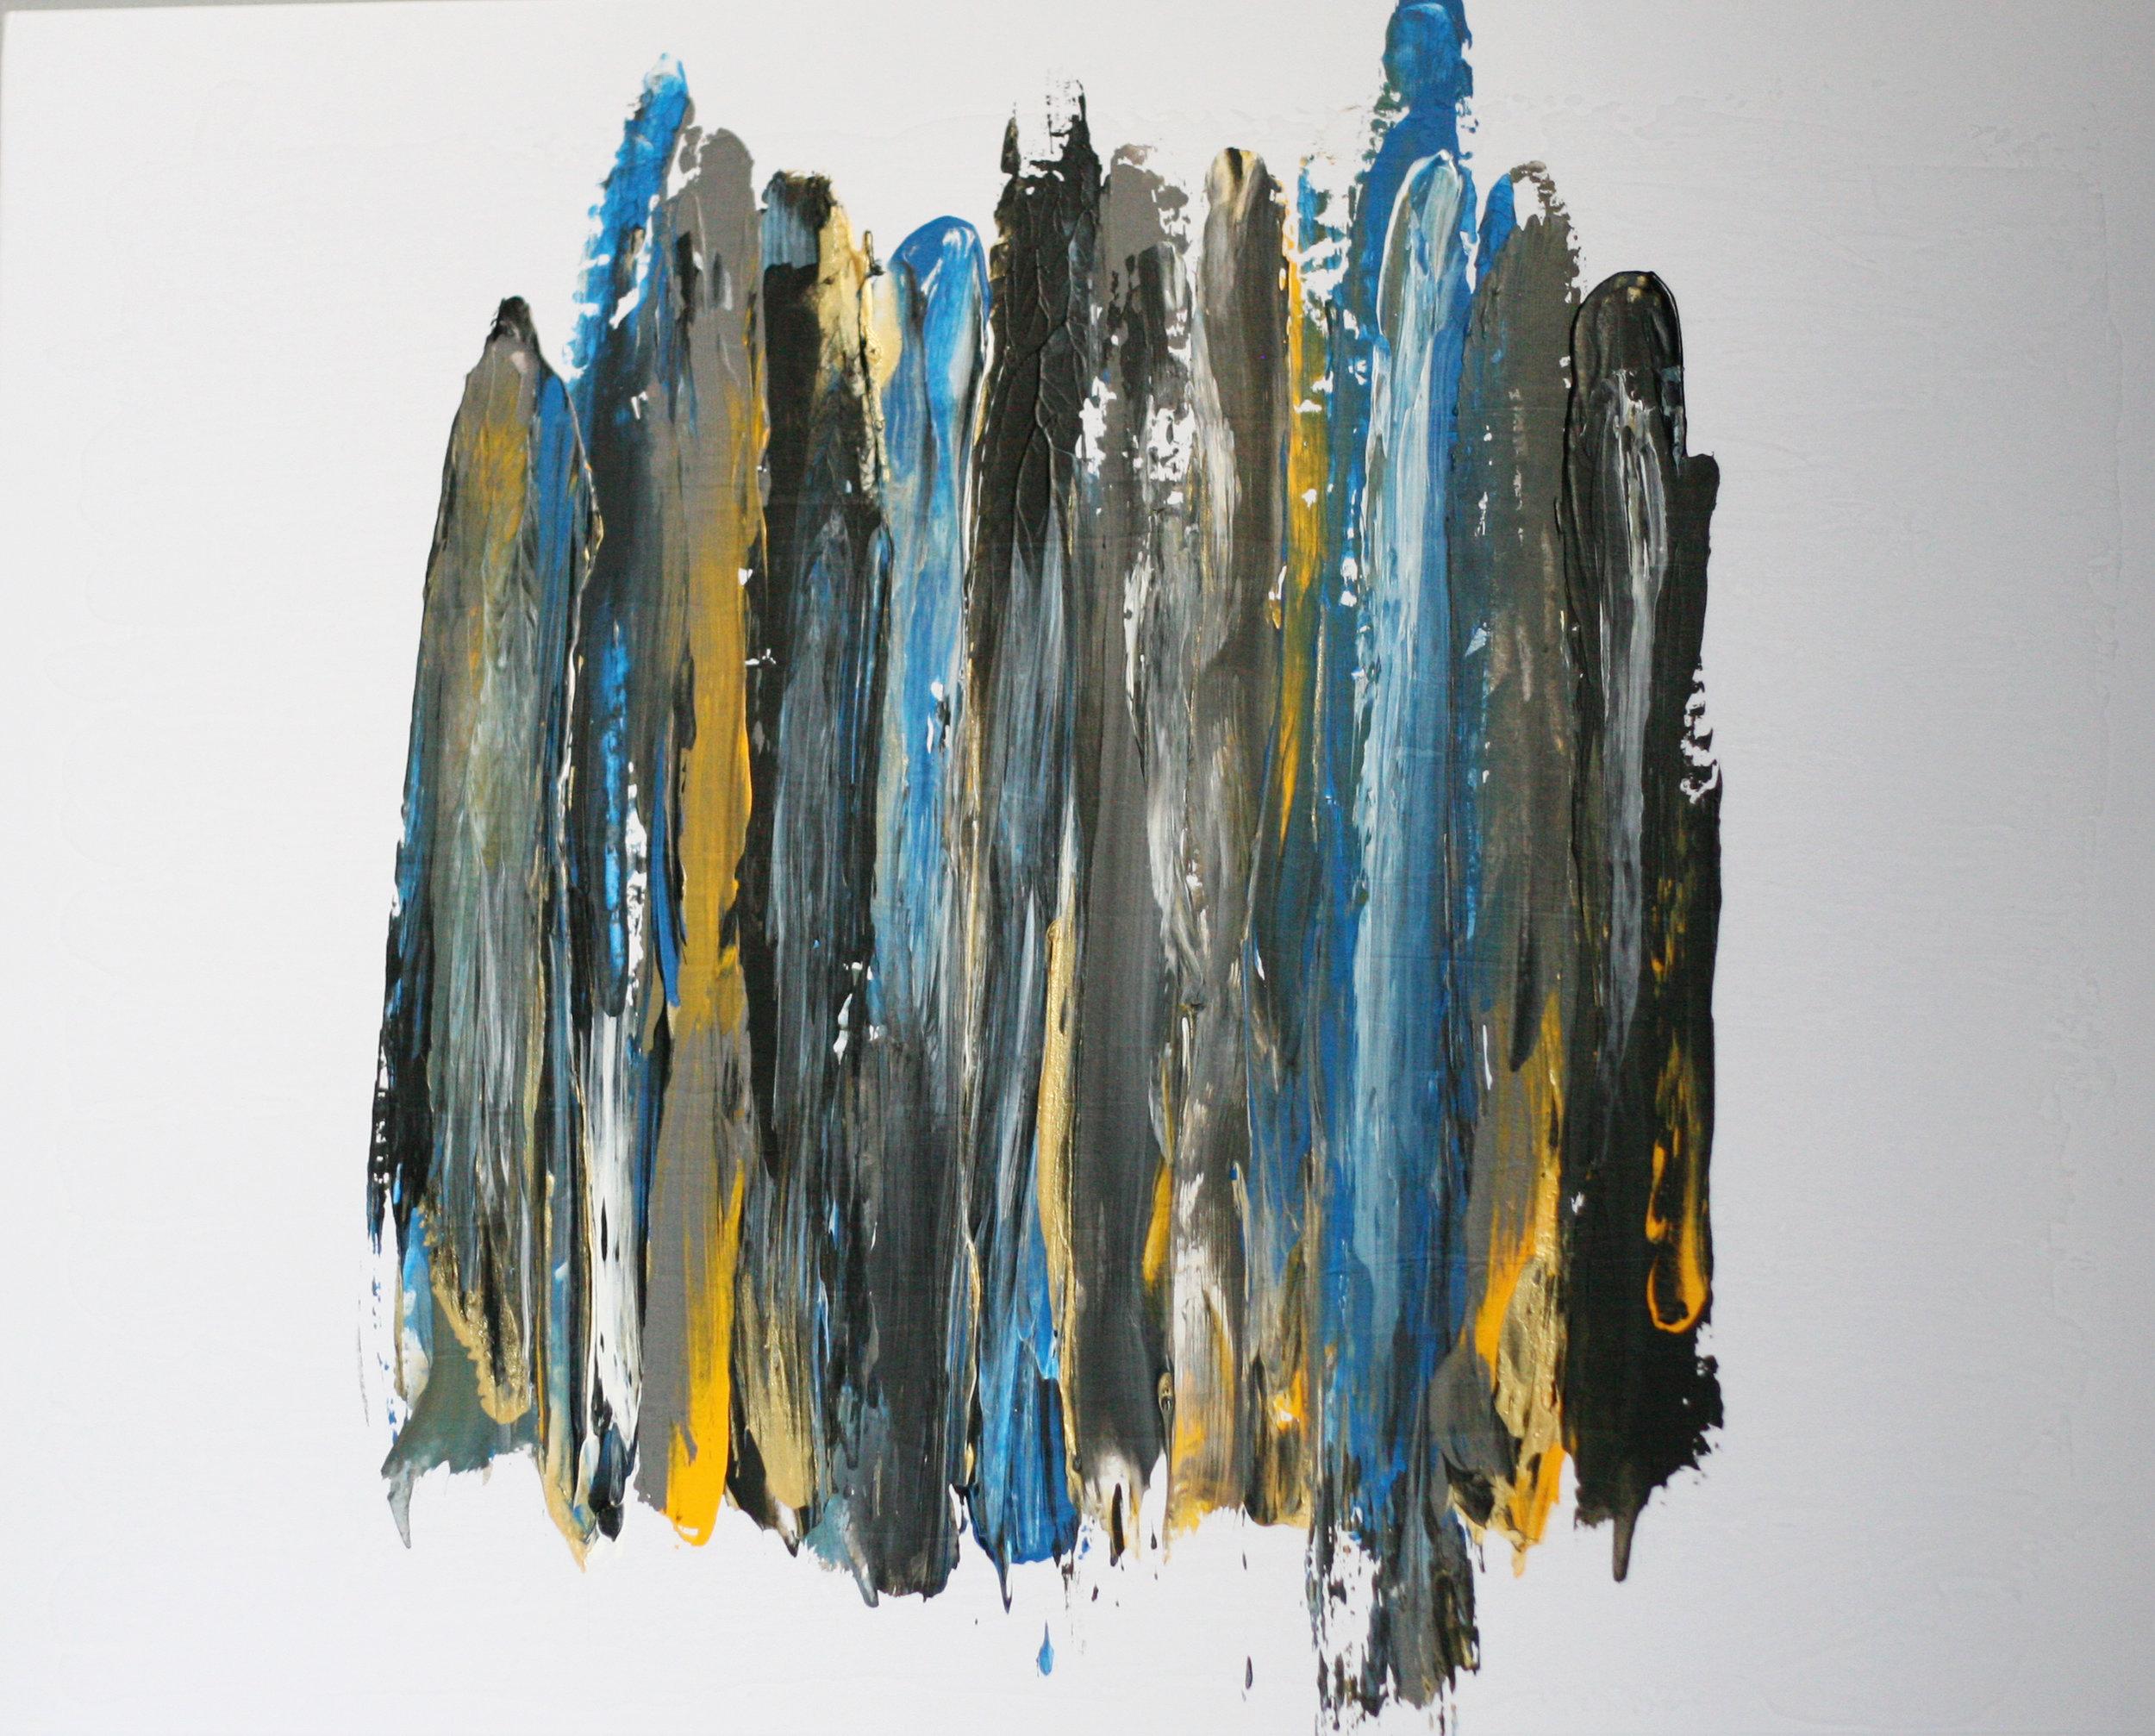 Only the Winds - Ólafur Arnalds